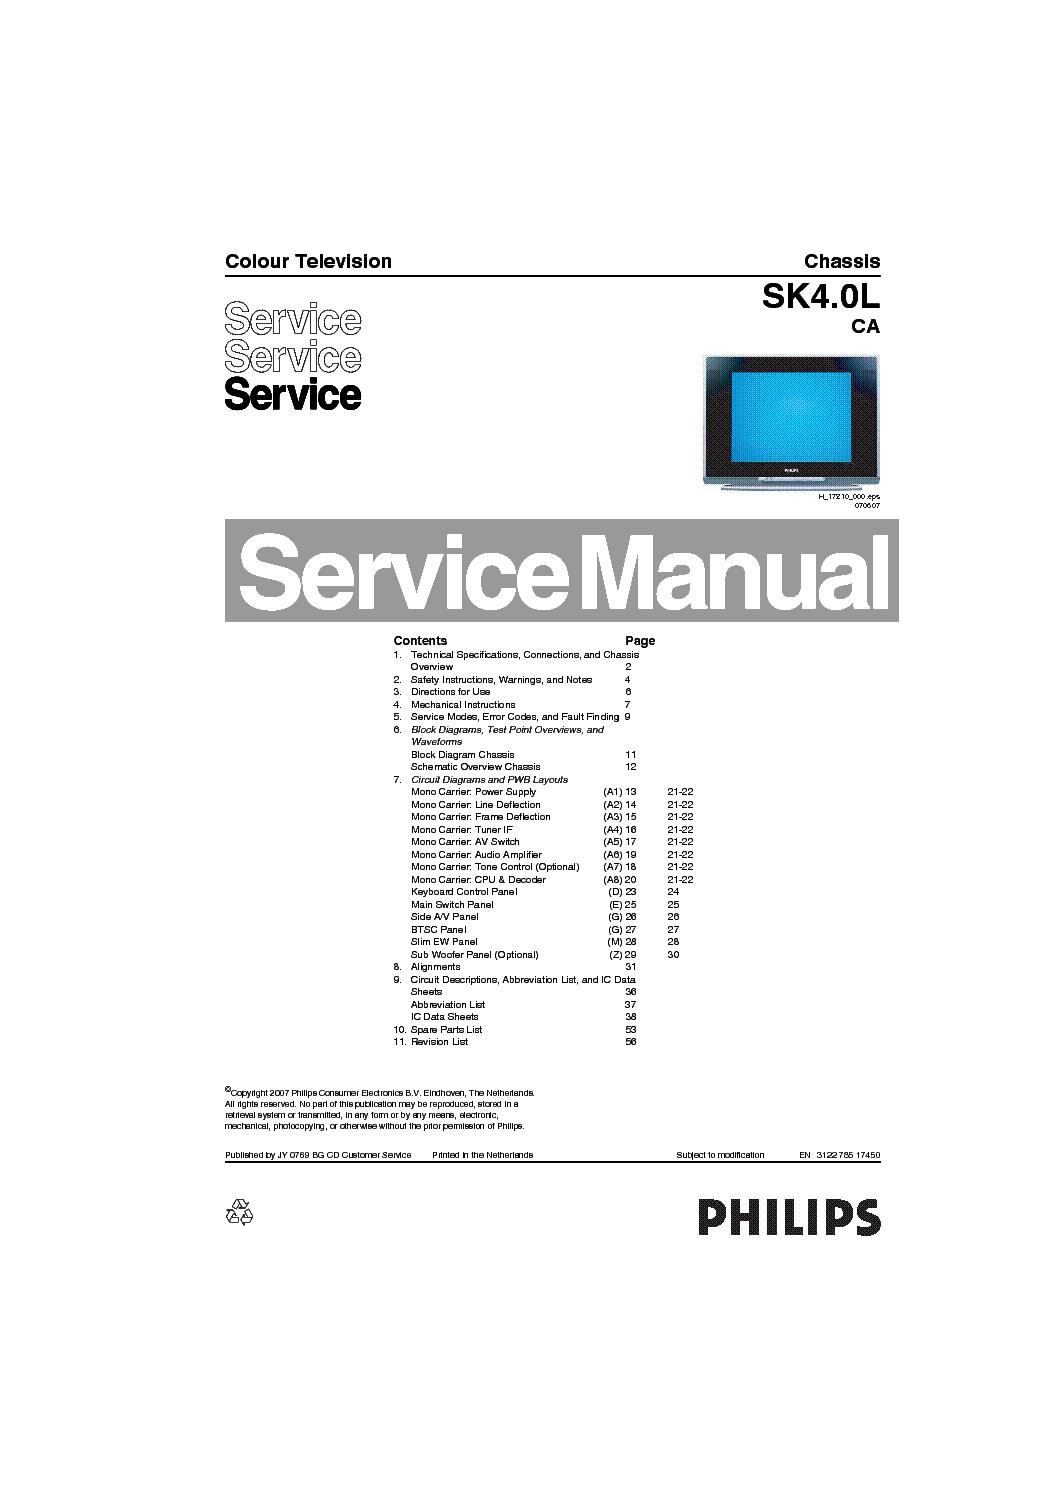 philips 21pt9457 chassis sk4 0l ca service manual download rh elektrotanya com manual da tv philips smart manual da tv philips 32 polegadas